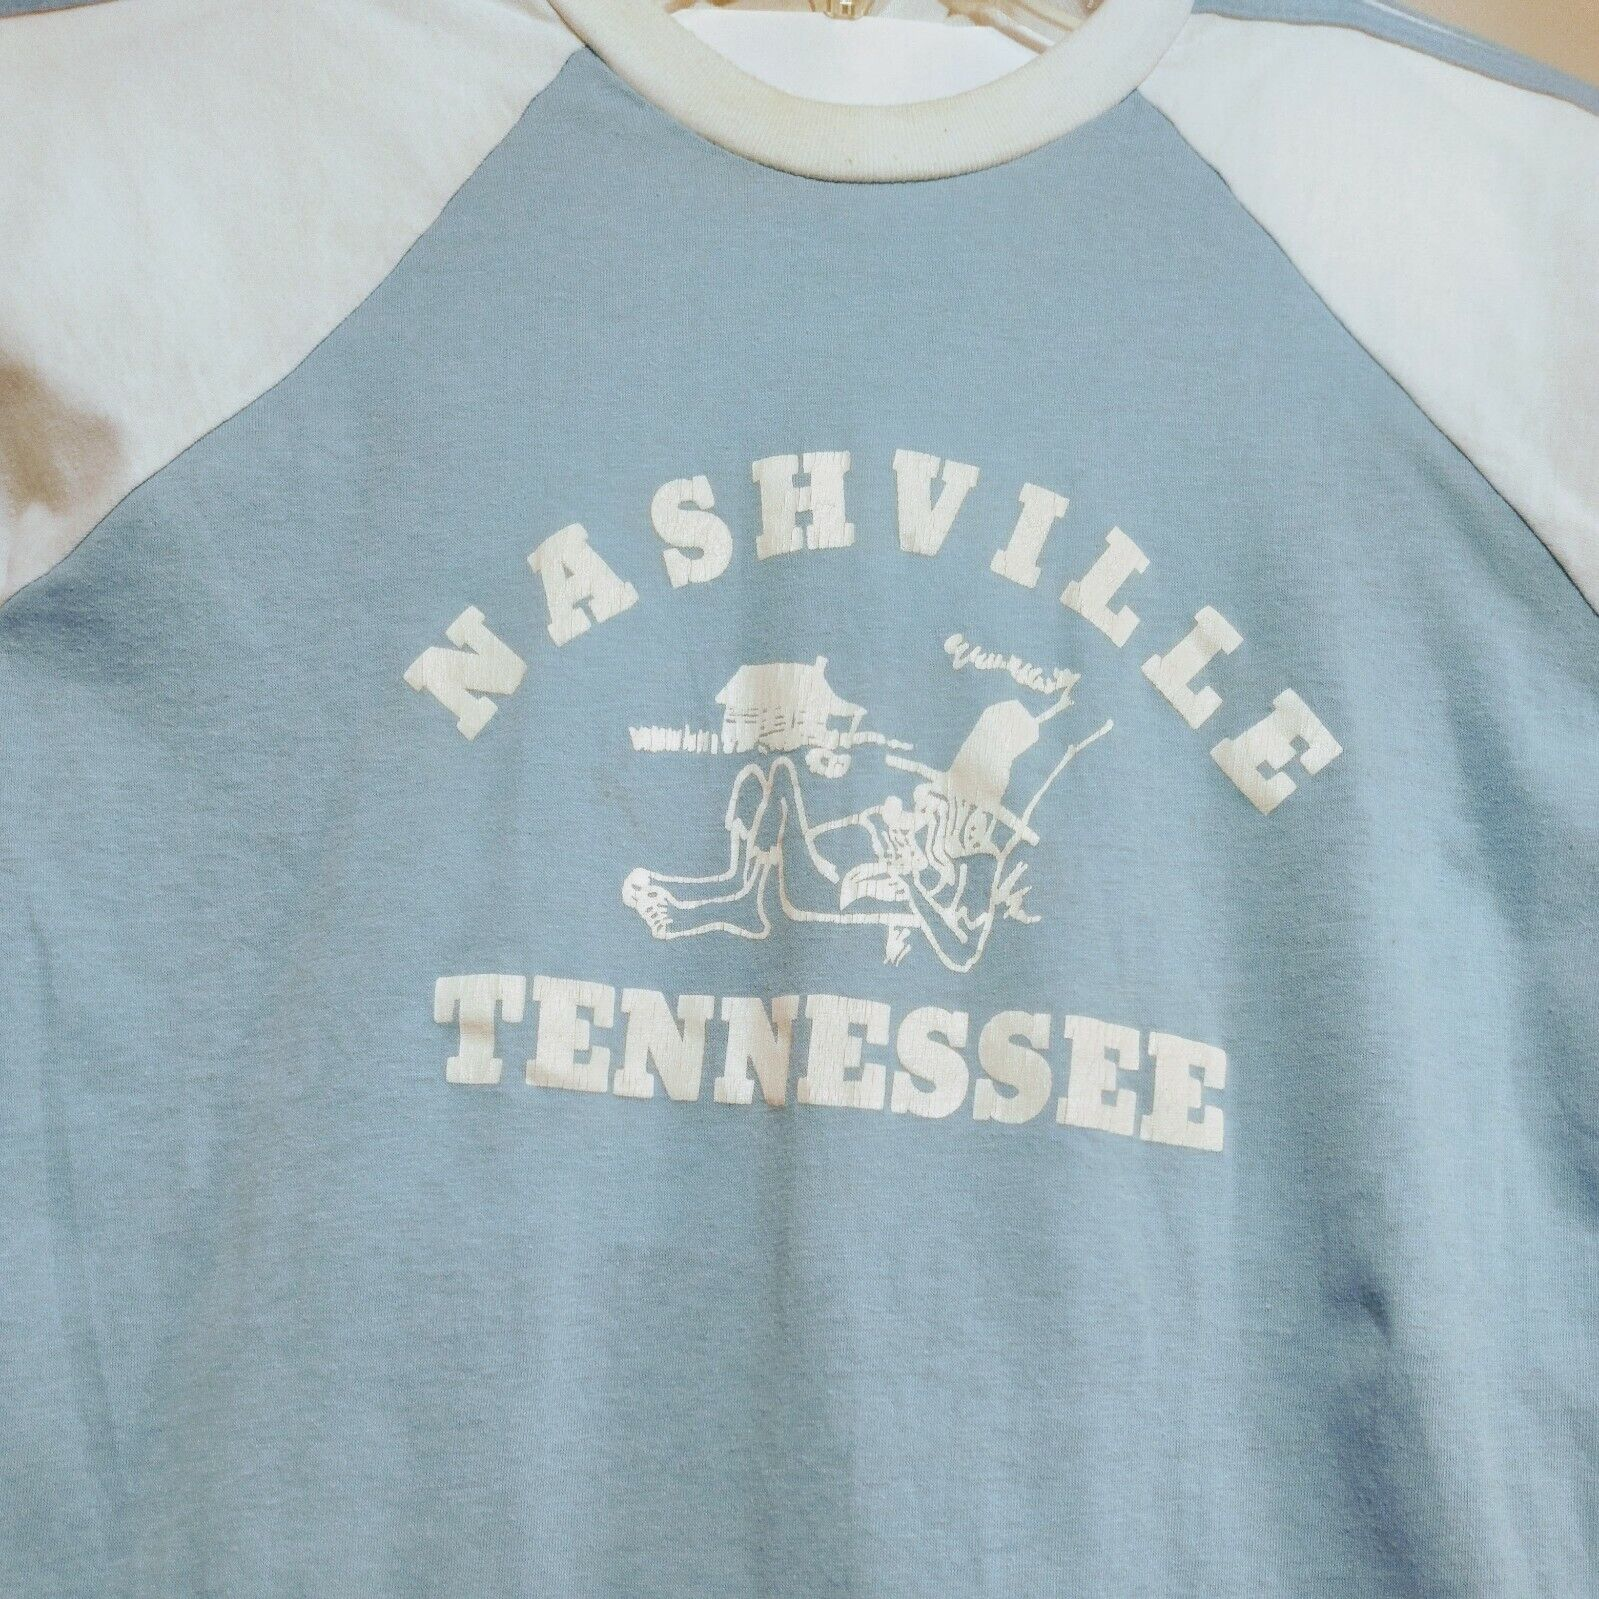 80s Nashville Jersey Knit 3 stripe Varsity Graphic Tshirt fits L VintageOldStock